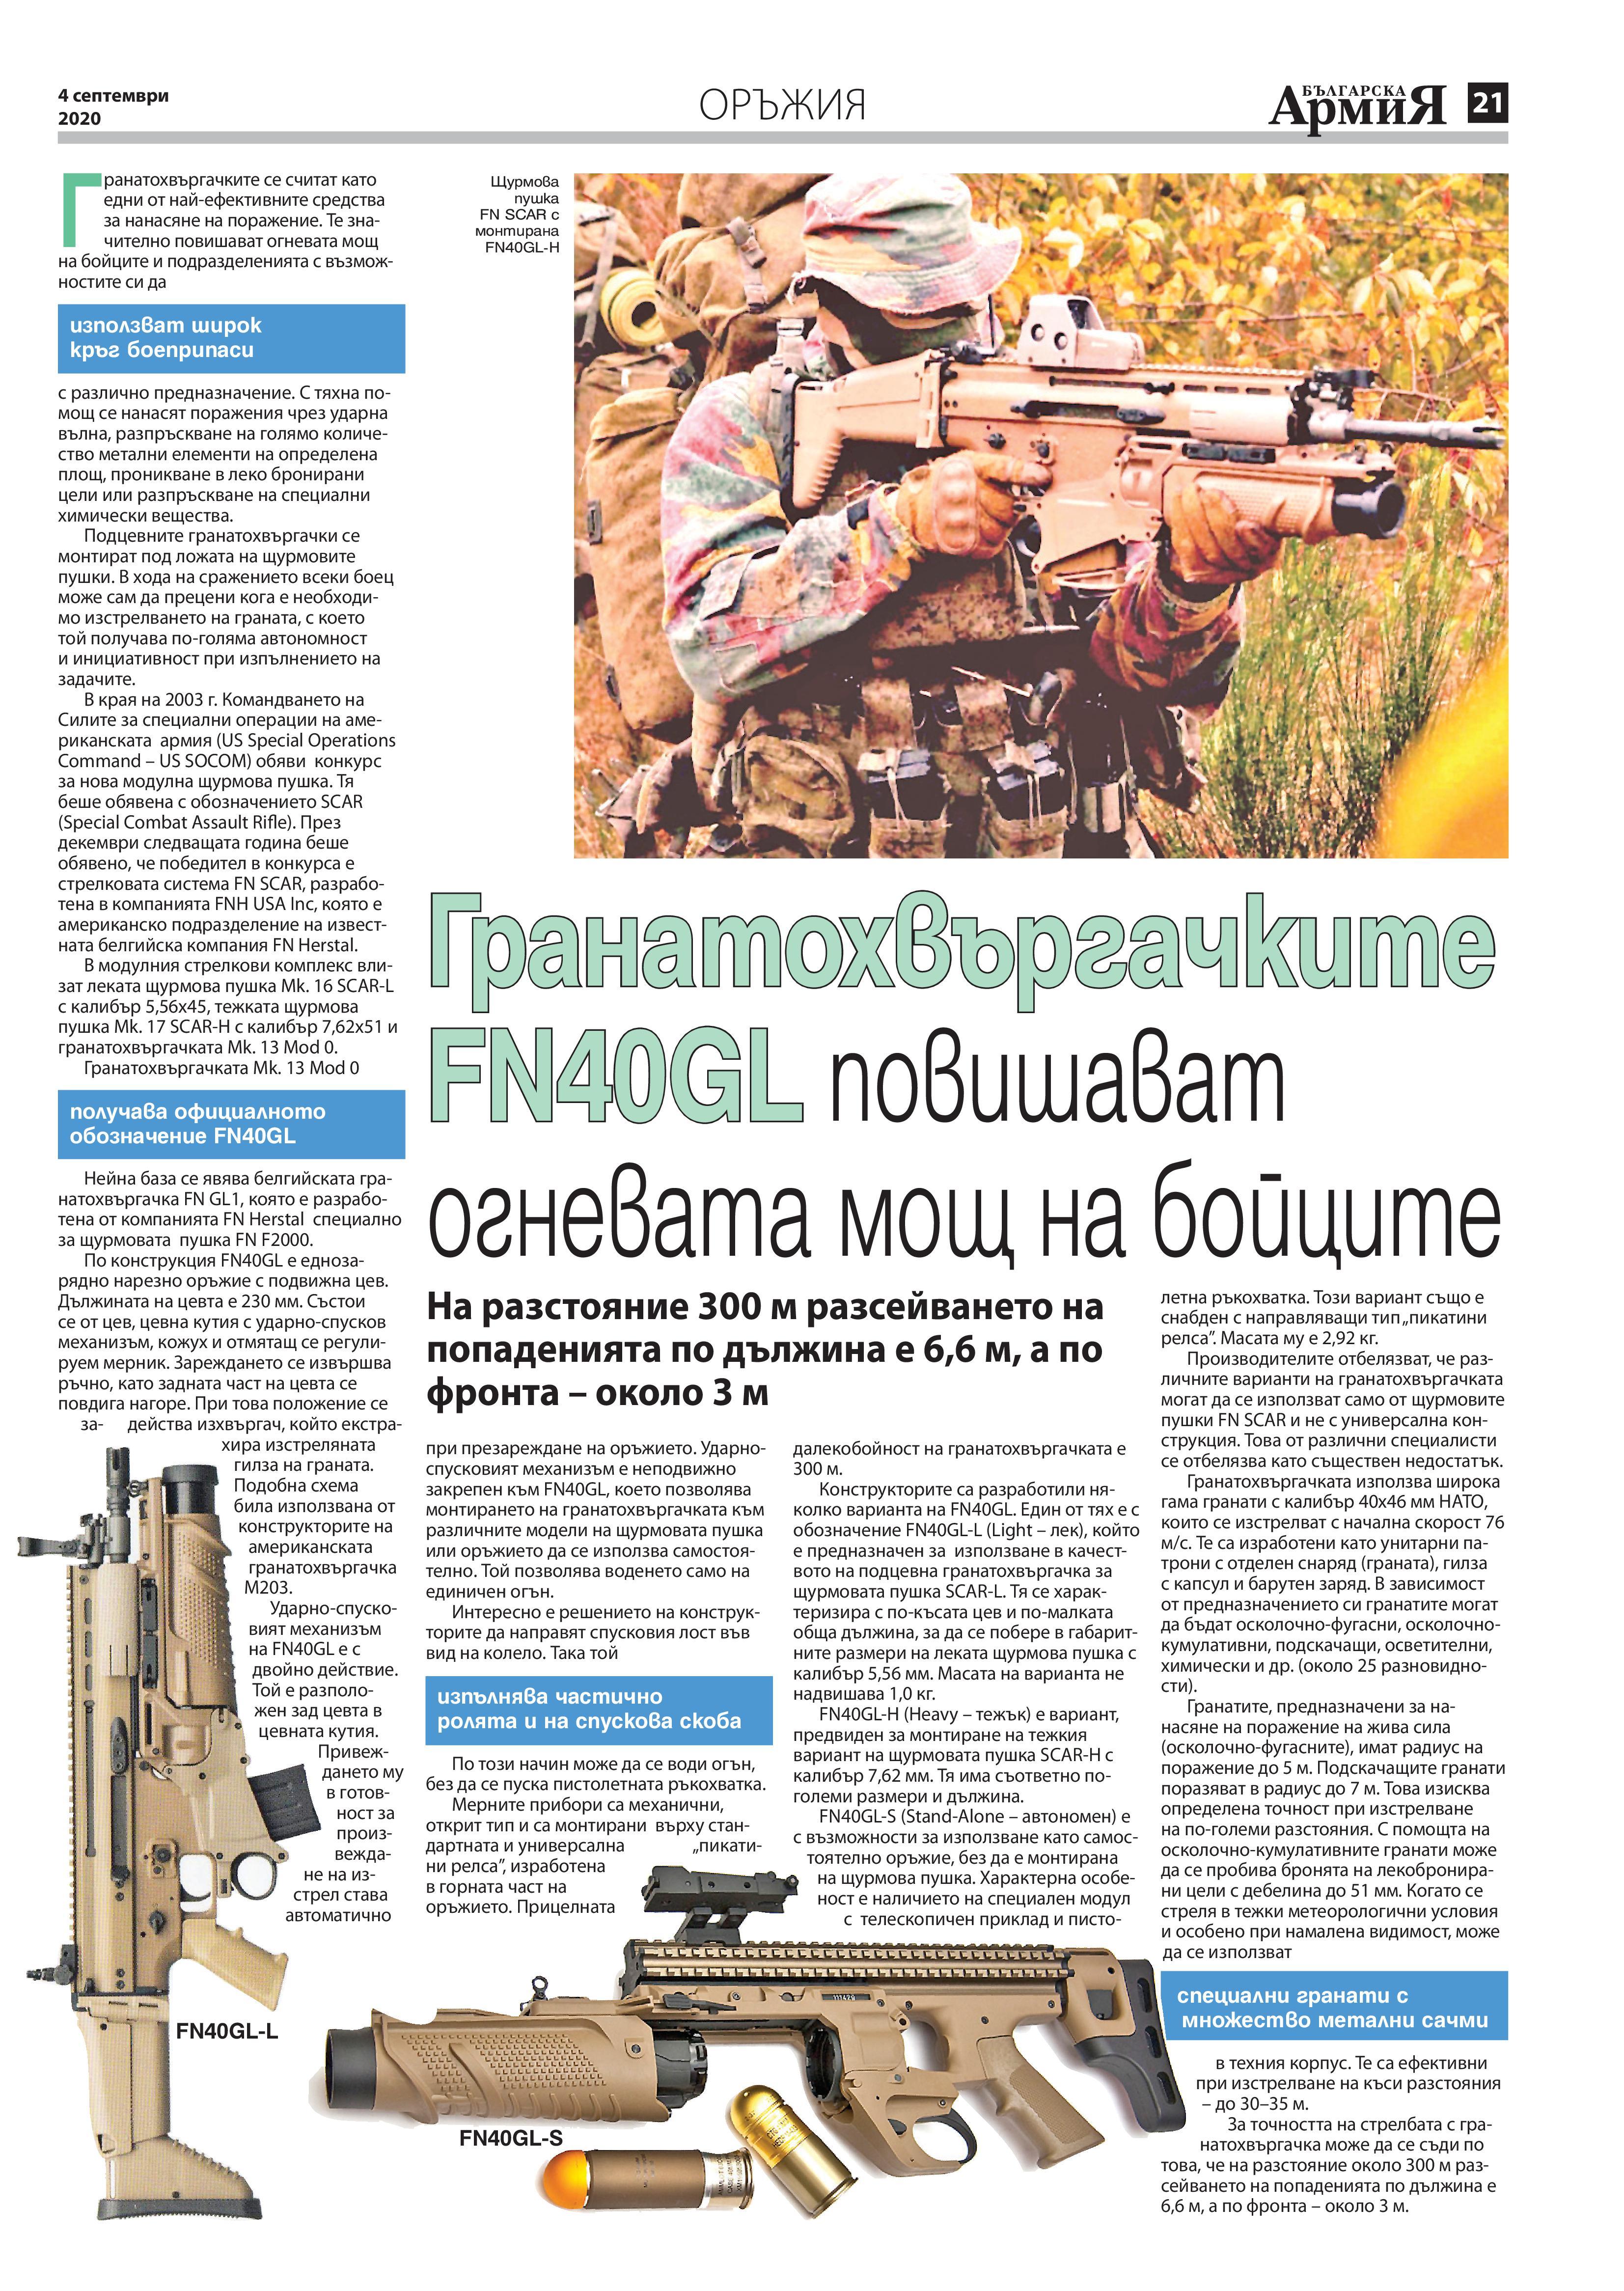 https://www.armymedia.bg/wp-content/uploads/2015/06/21-39.jpg